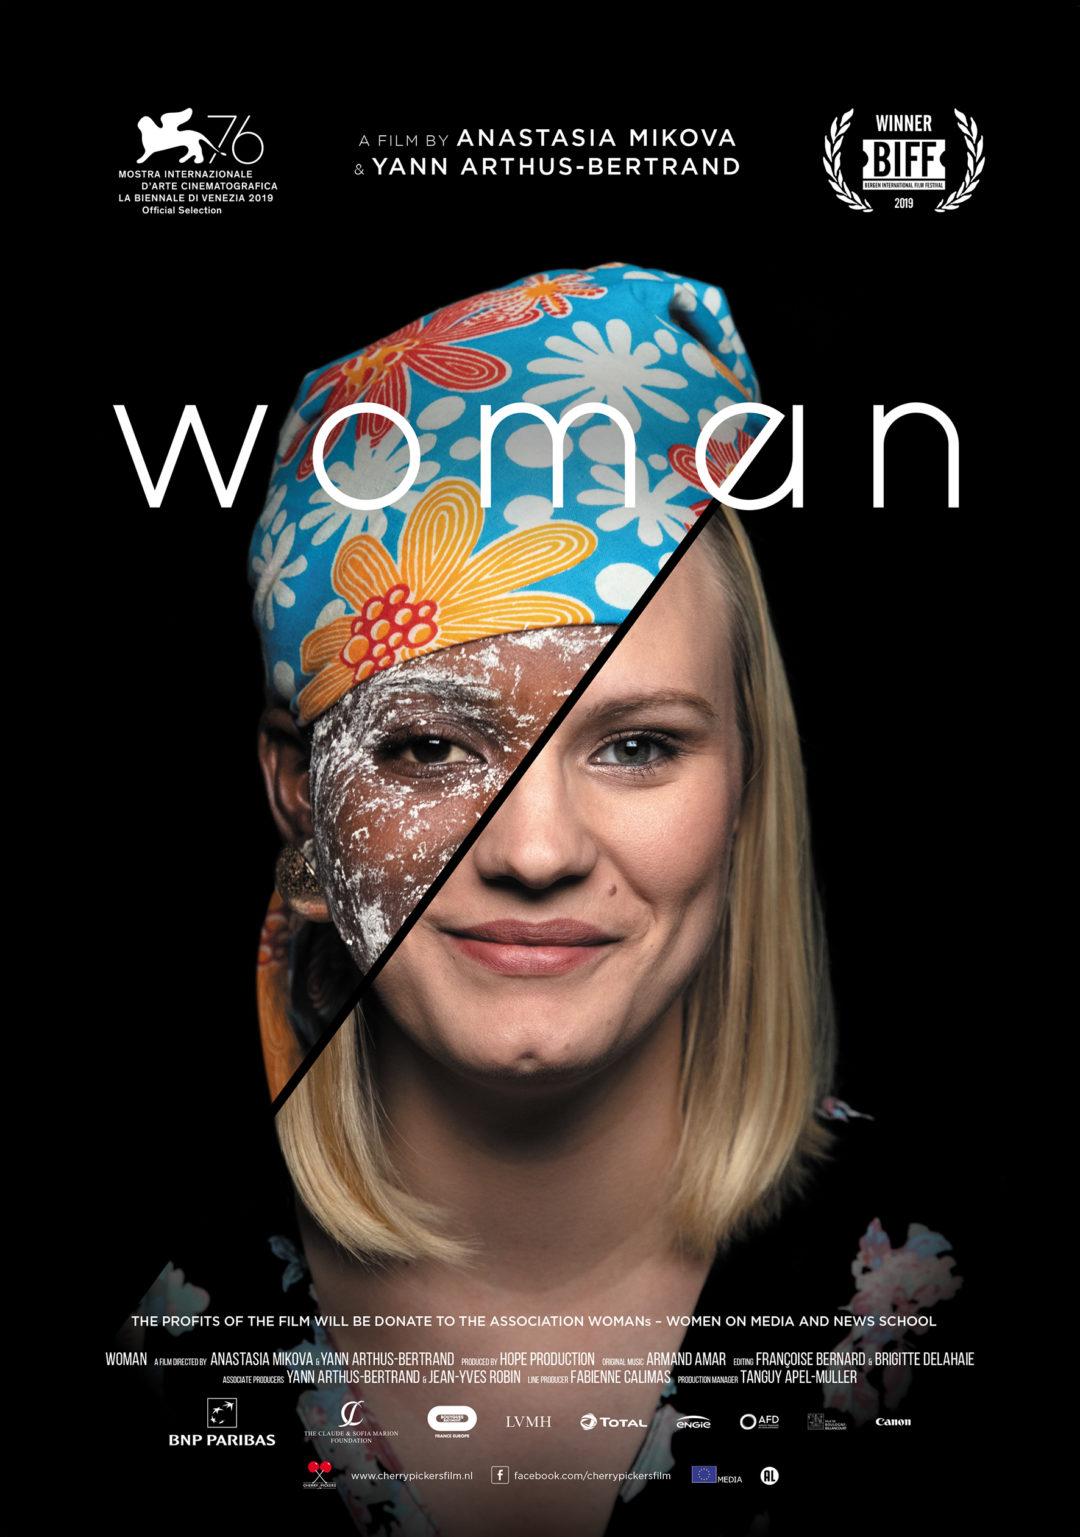 Woman_ps_1_jpg_sd-high.jpg